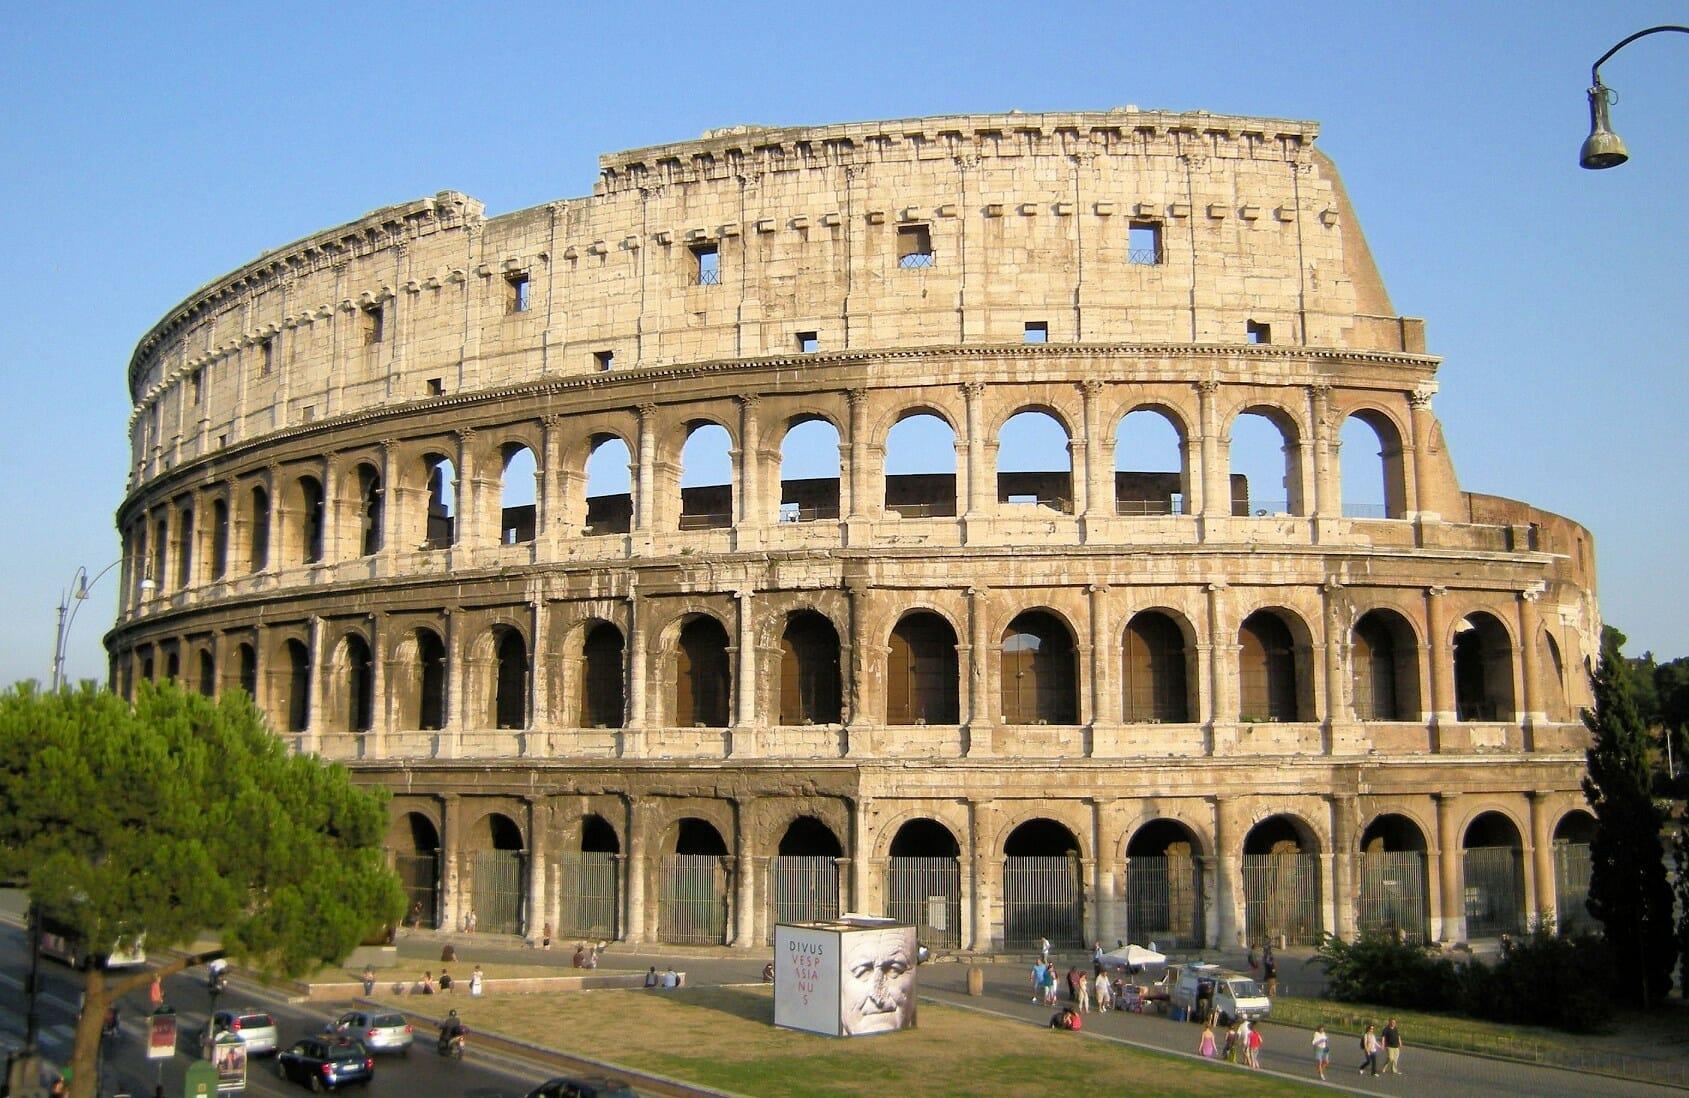 Rome Tours Colosseum